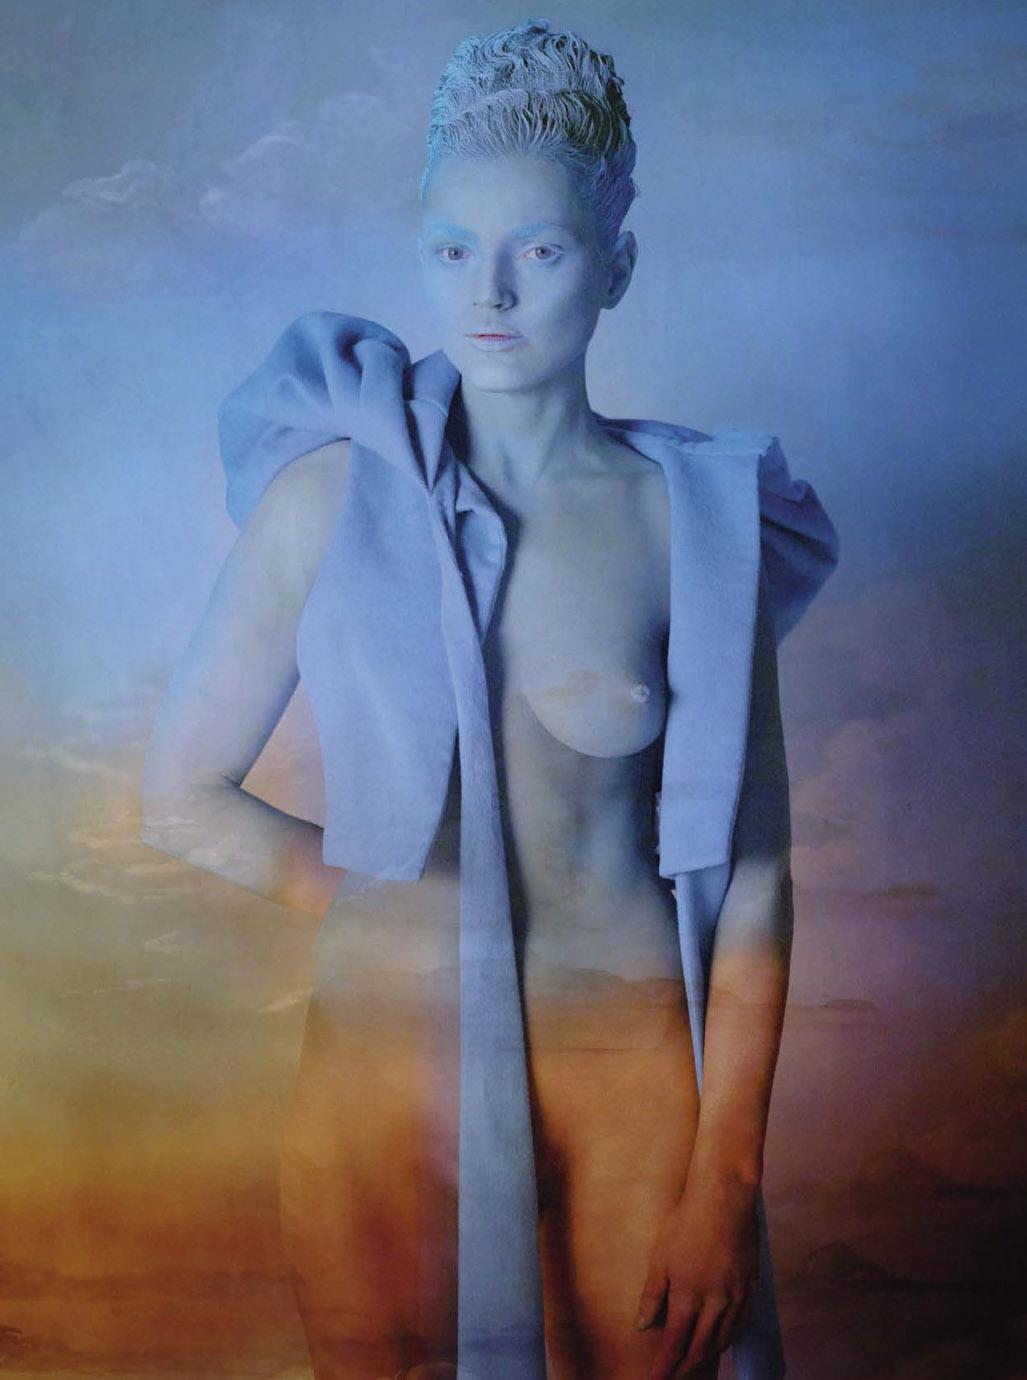 Fools Paradise / Guinevere van Seenus by Mert Alas and Marcus Piggott / Vogue Italia september 2018